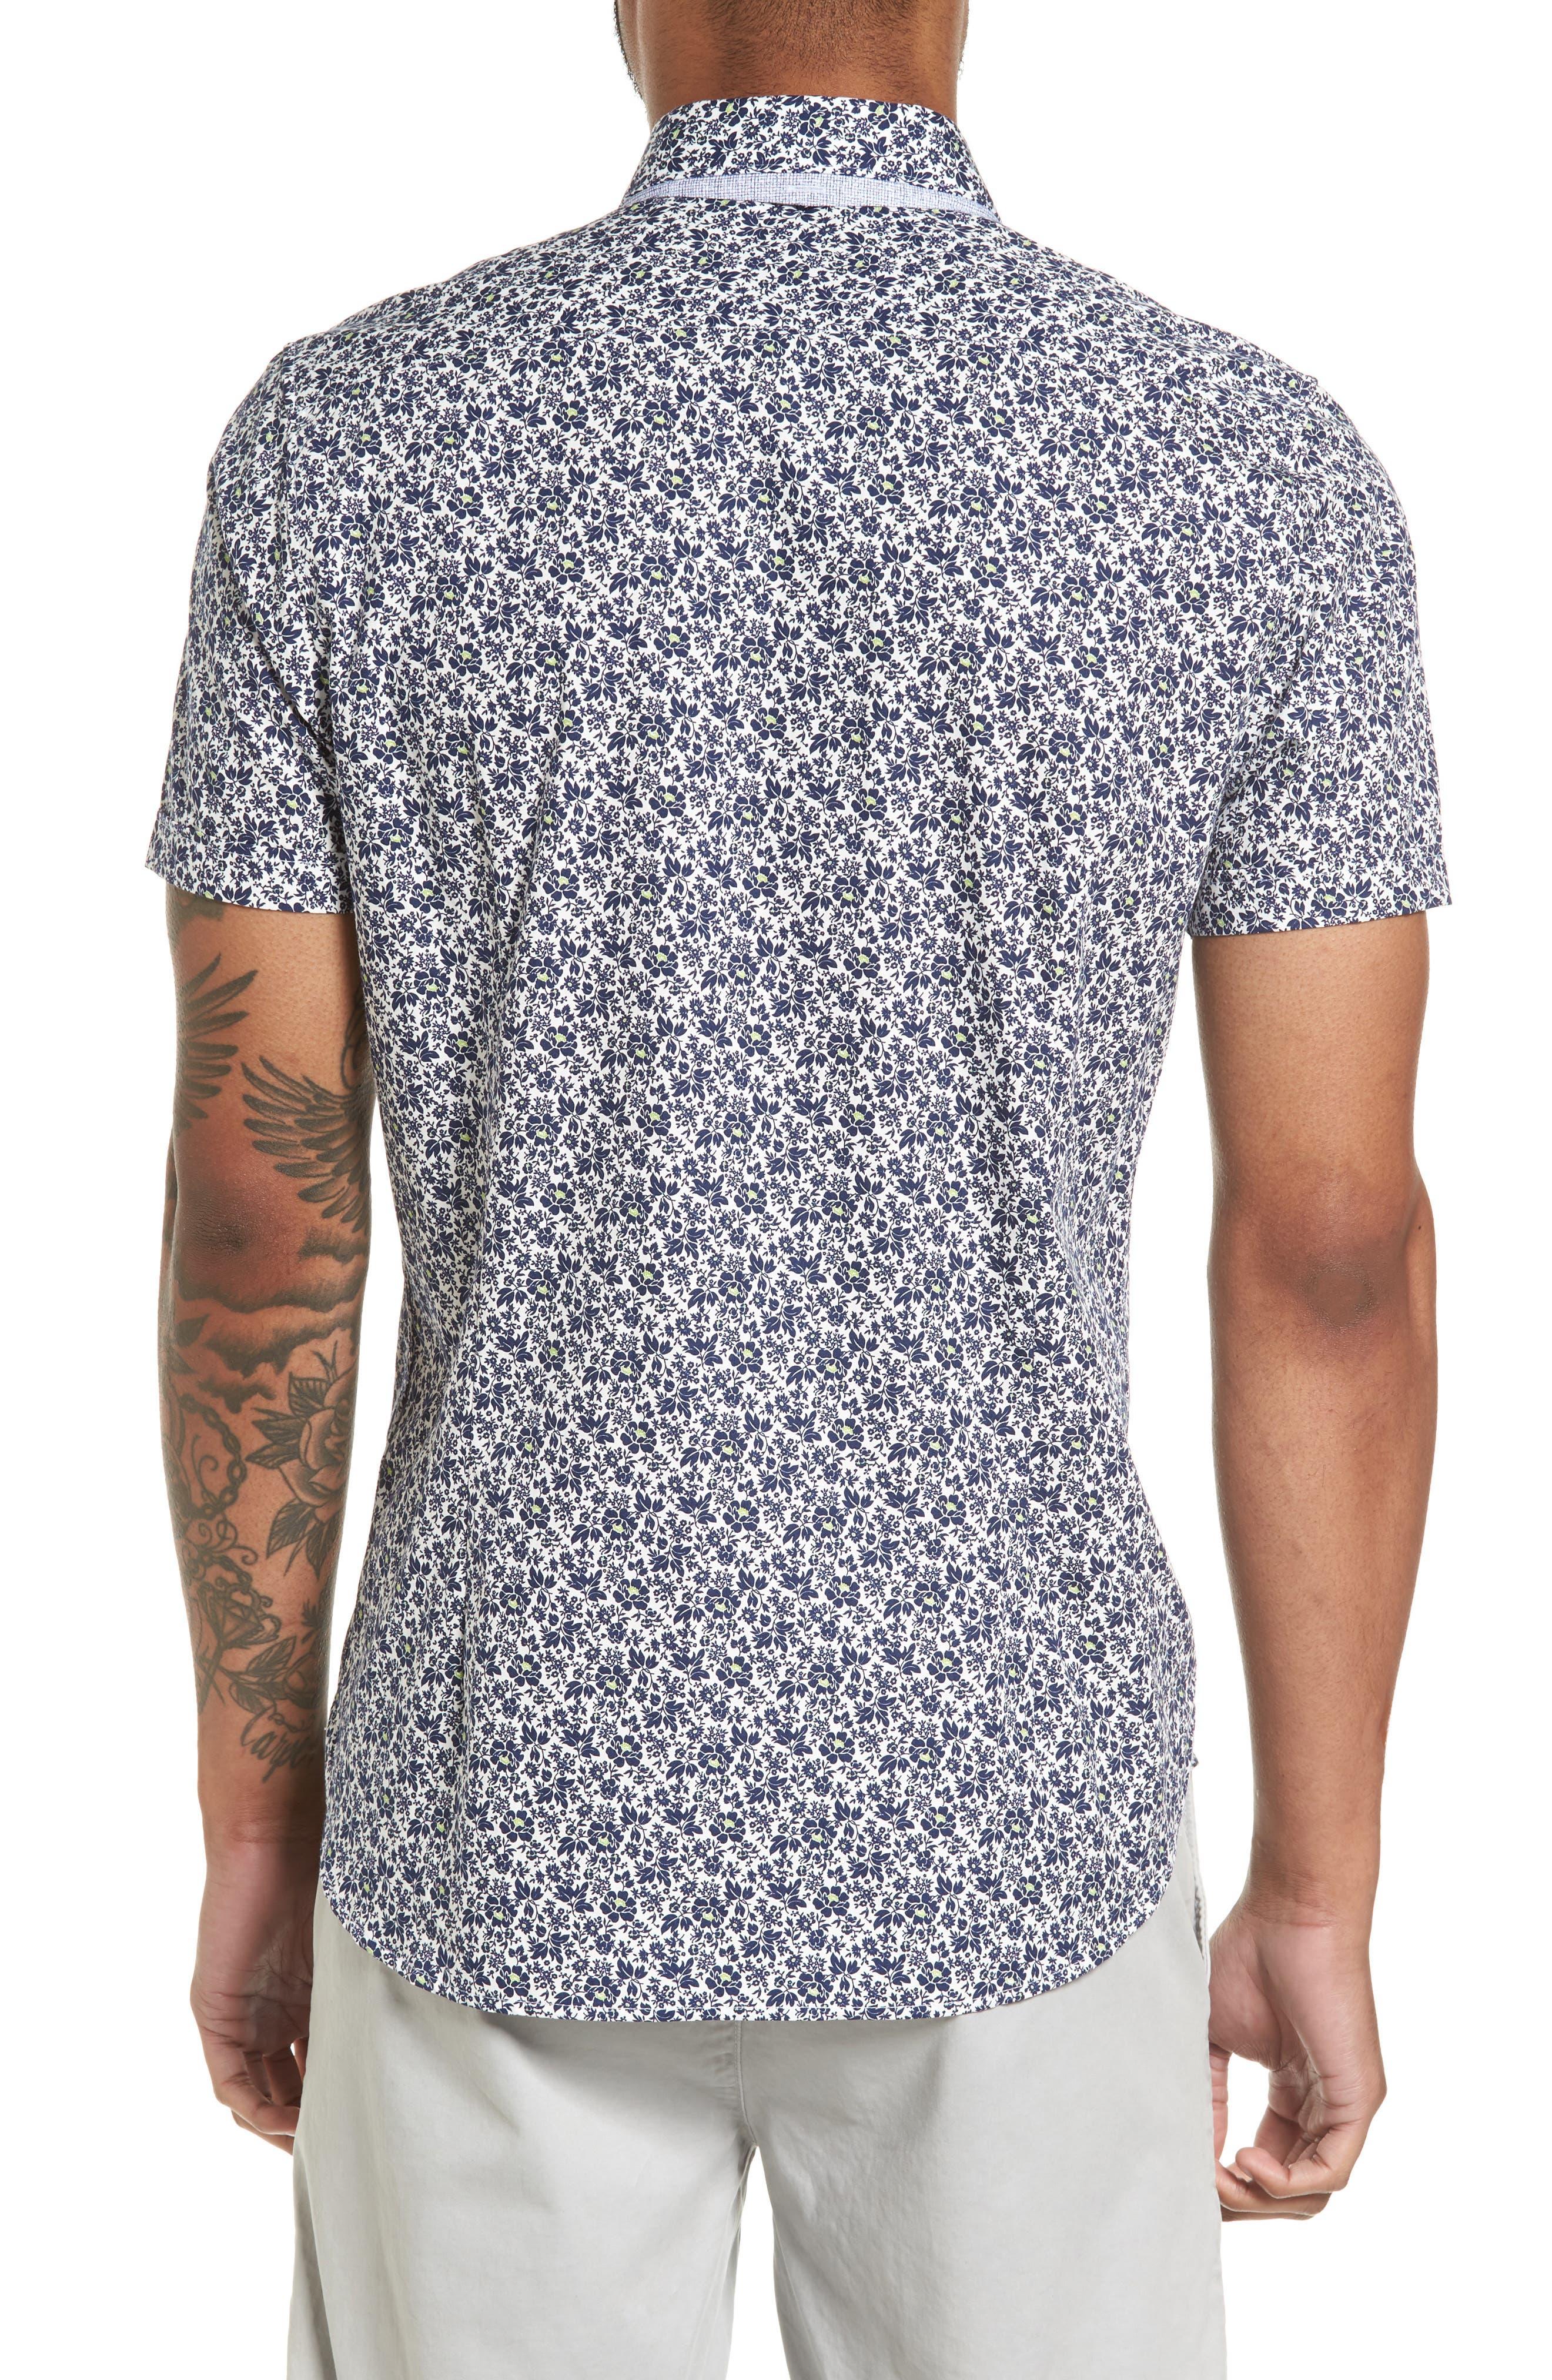 Alygar Slim Fit Floral Woven Shirt,                             Alternate thumbnail 2, color,                             402